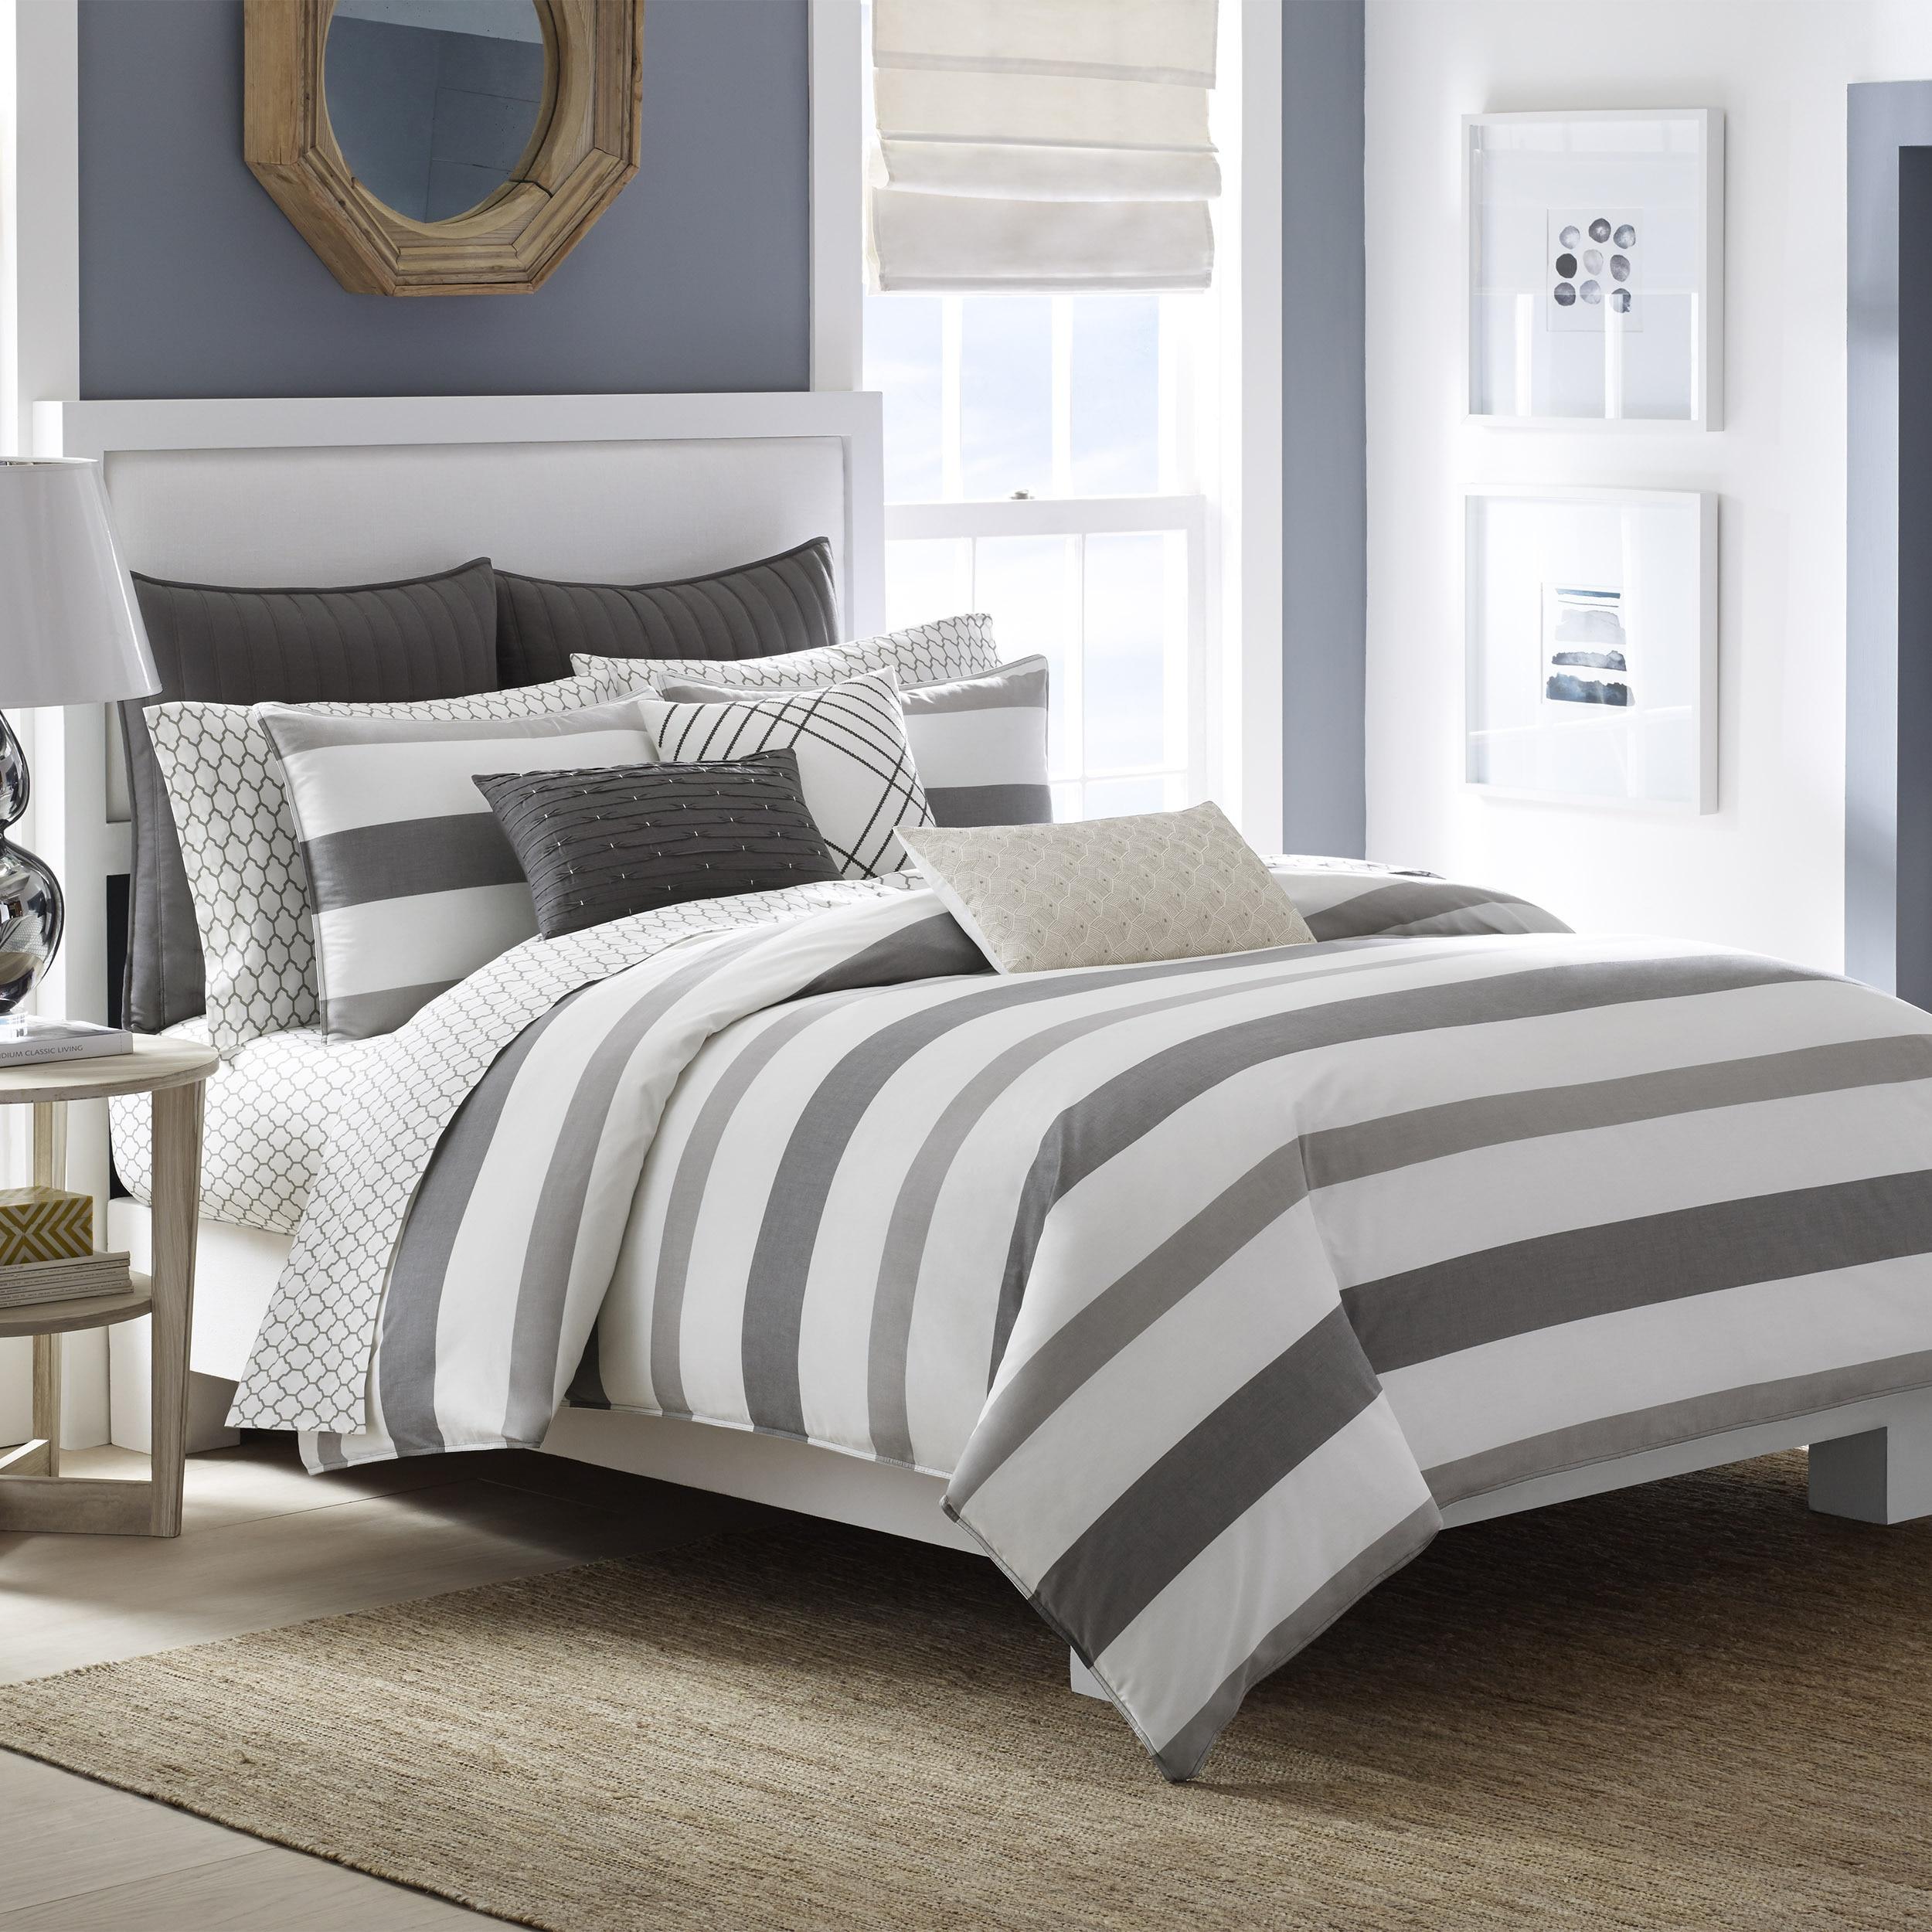 set a bed california bedroom bag sets in nautica jasmine king comforter piece twin blue